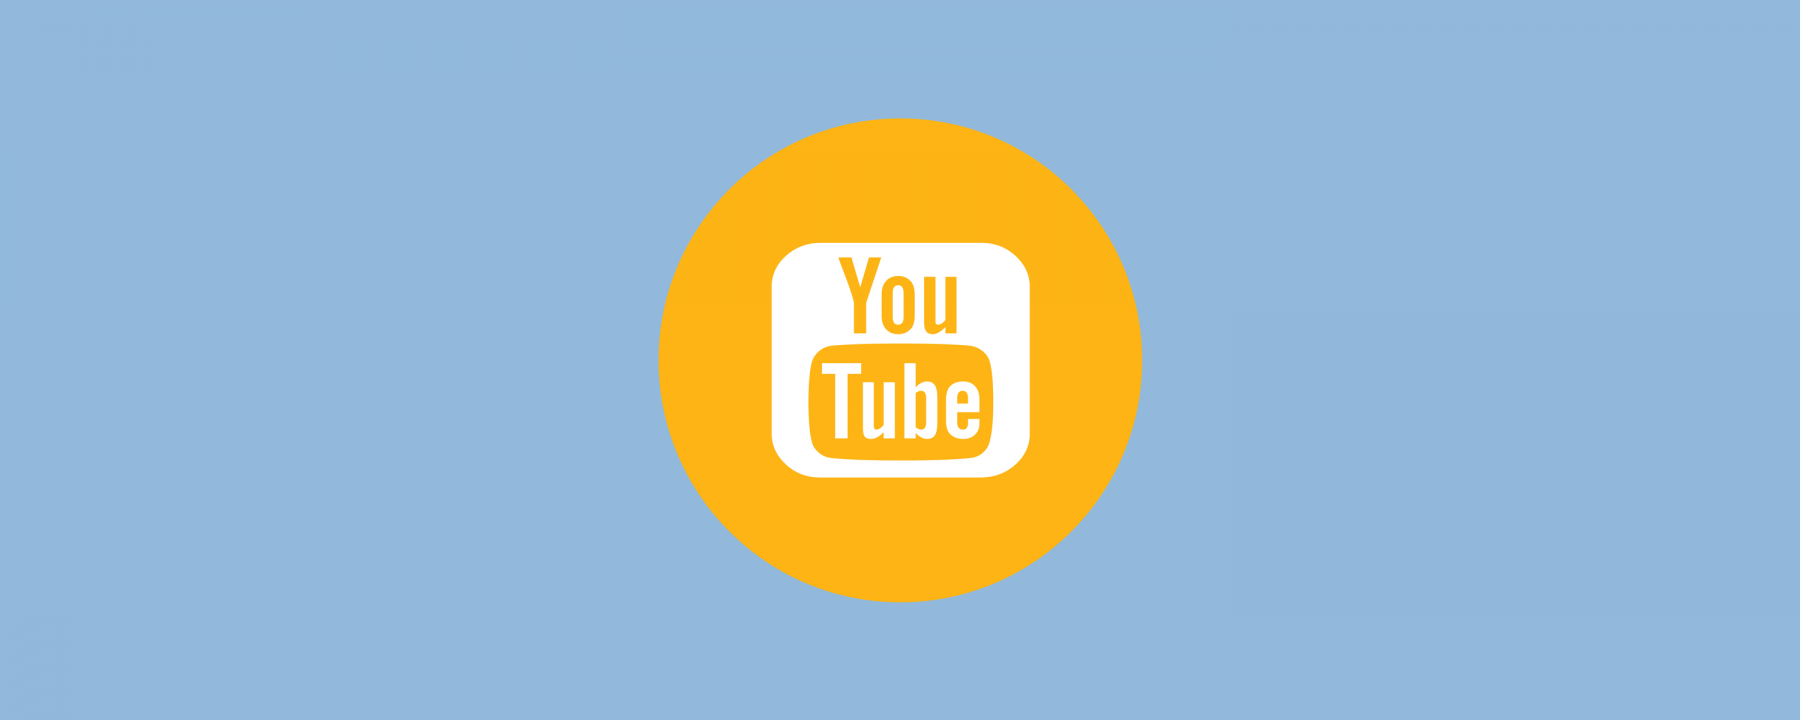 Somnolab – Videos ab sofort online